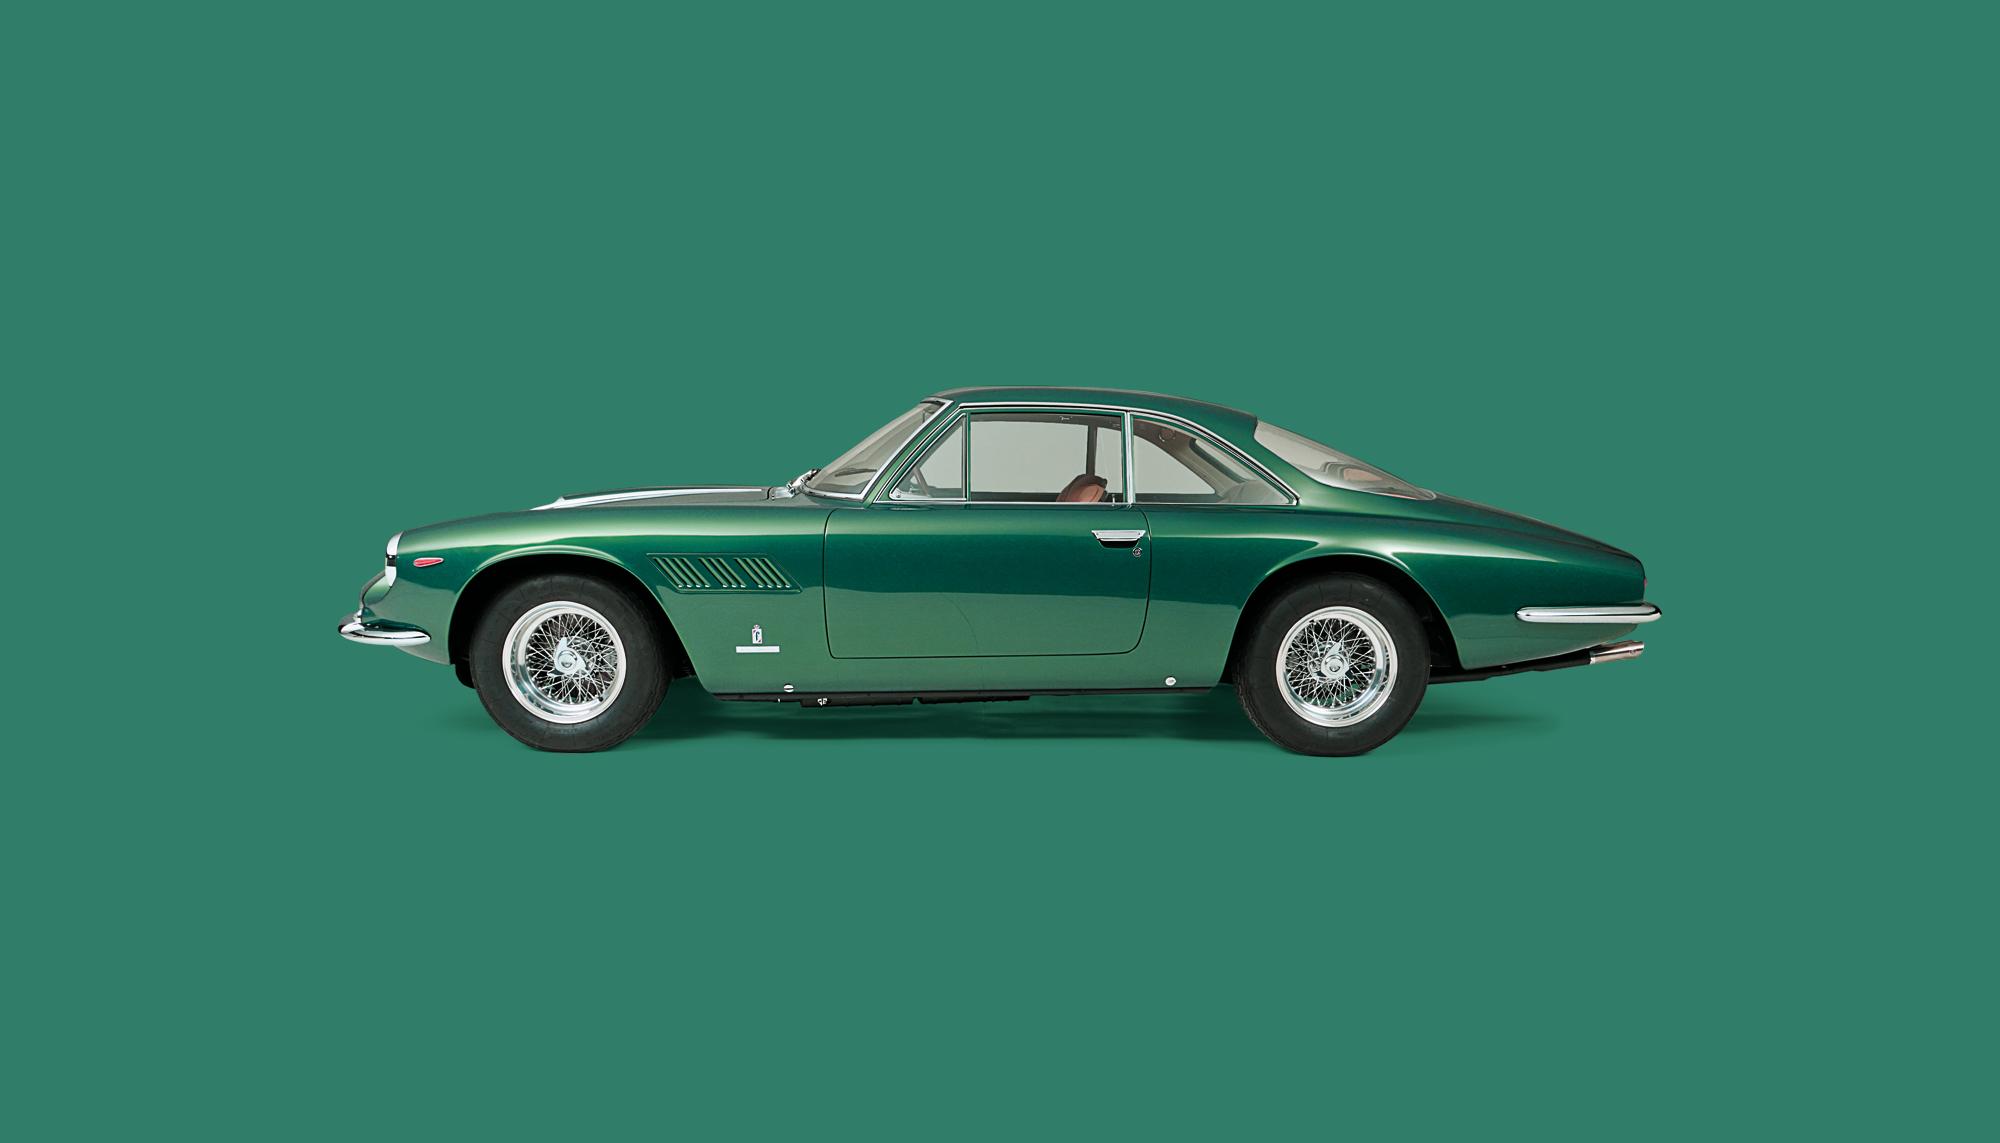 Bekijk Ferrari 500 Superfast Speziale in het Louwman Museum